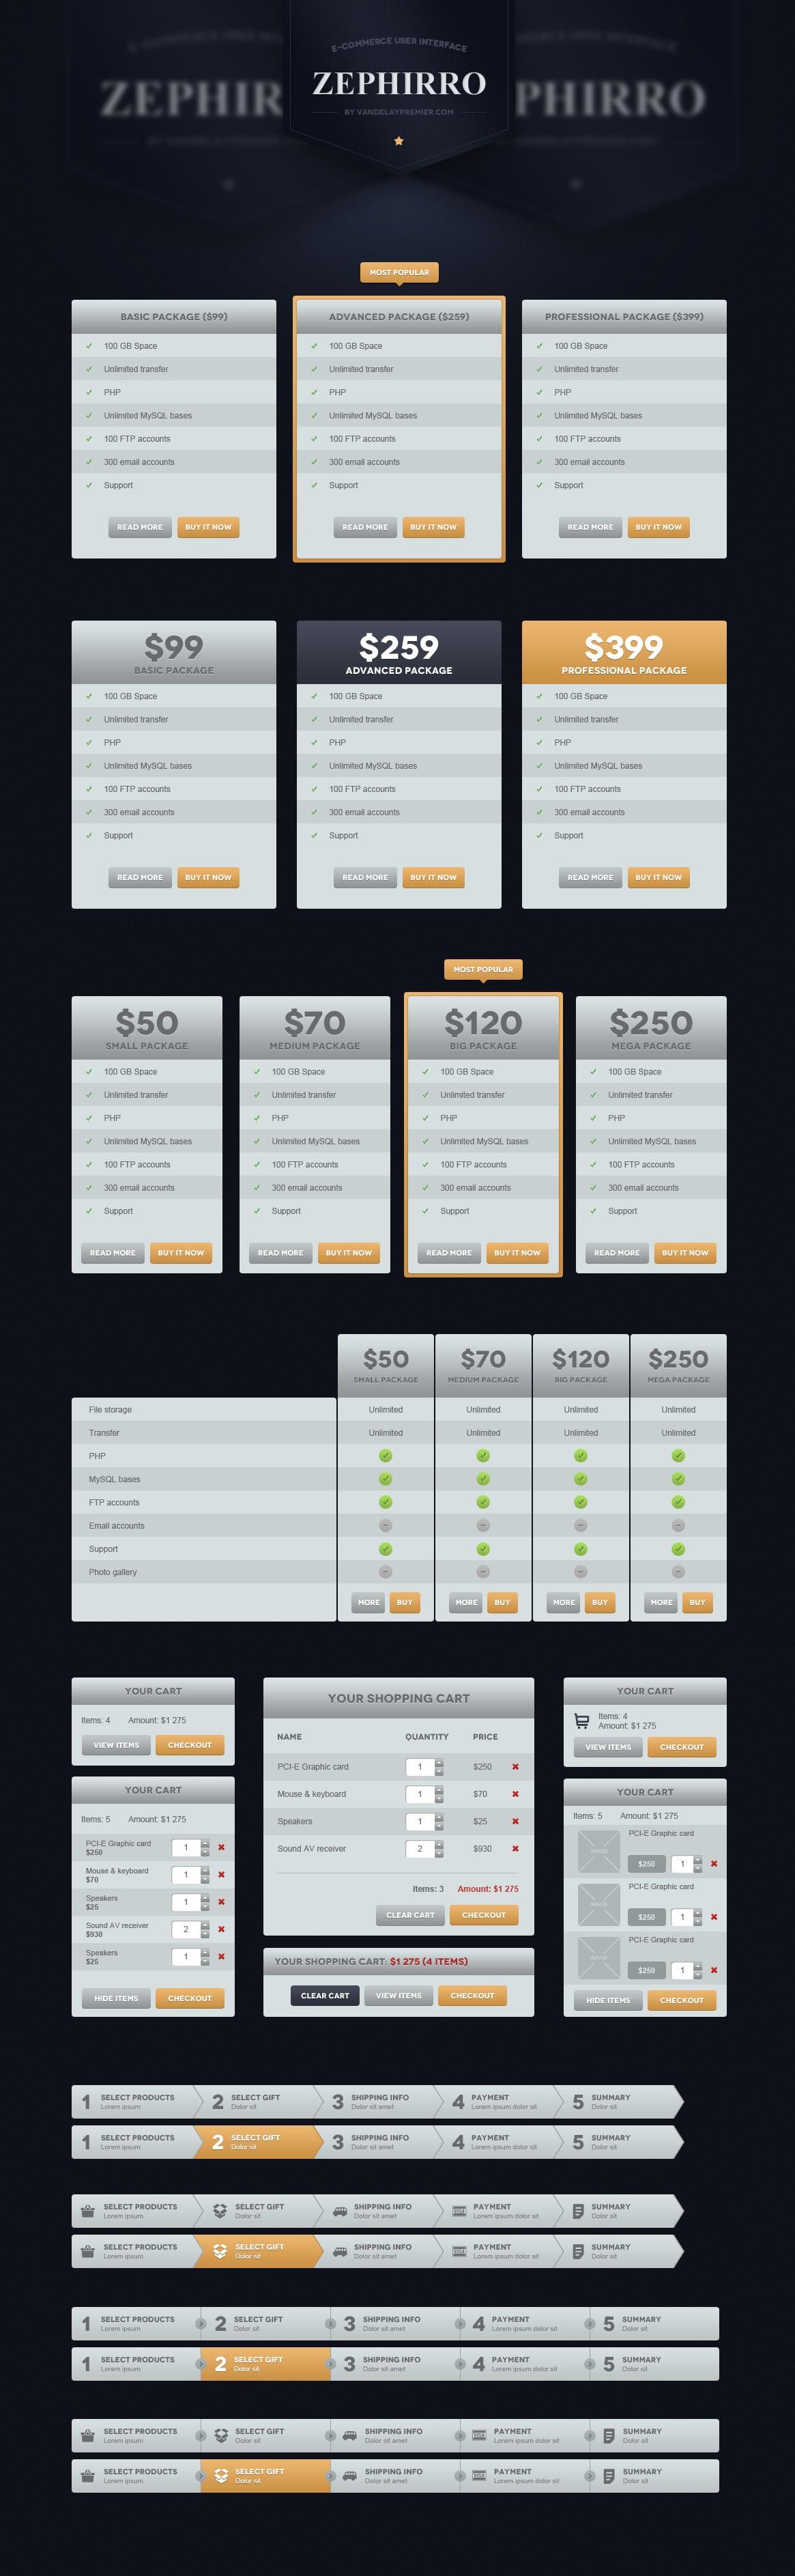 Zephirro E-Commerce UI Set